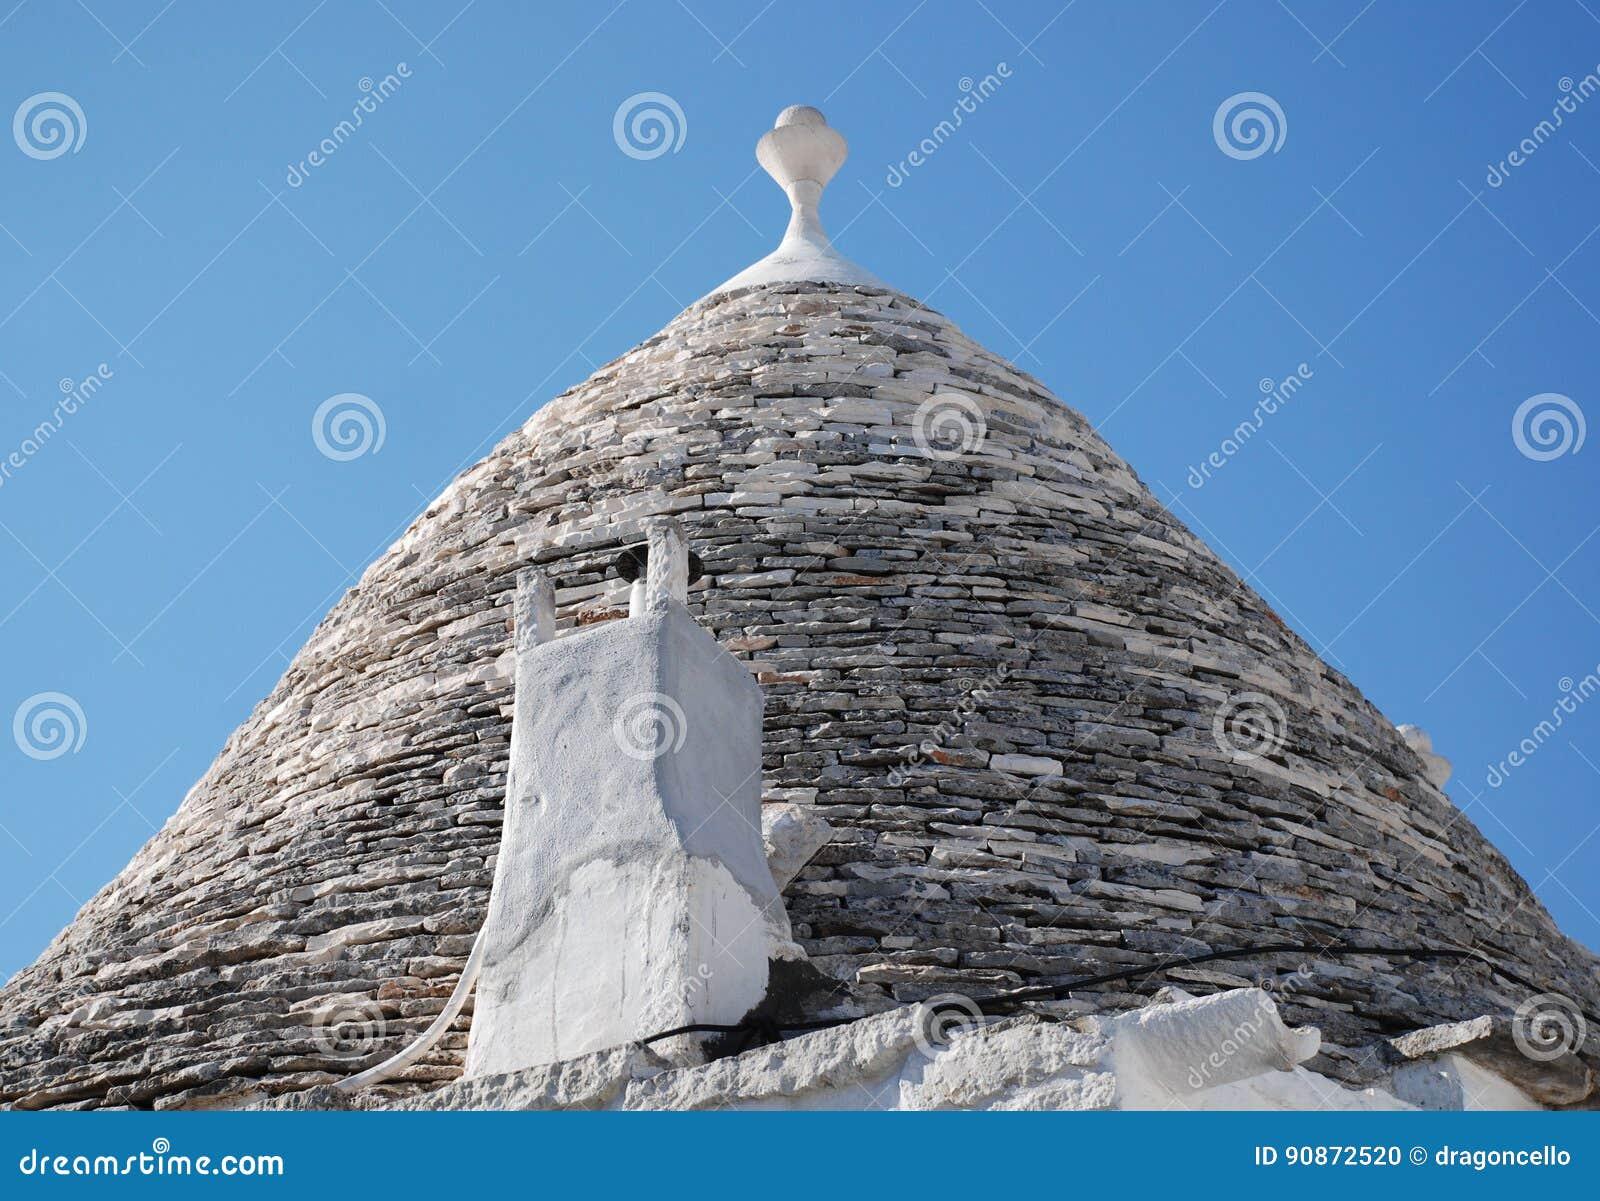 Trullo Roof with Chimney, Alberobello